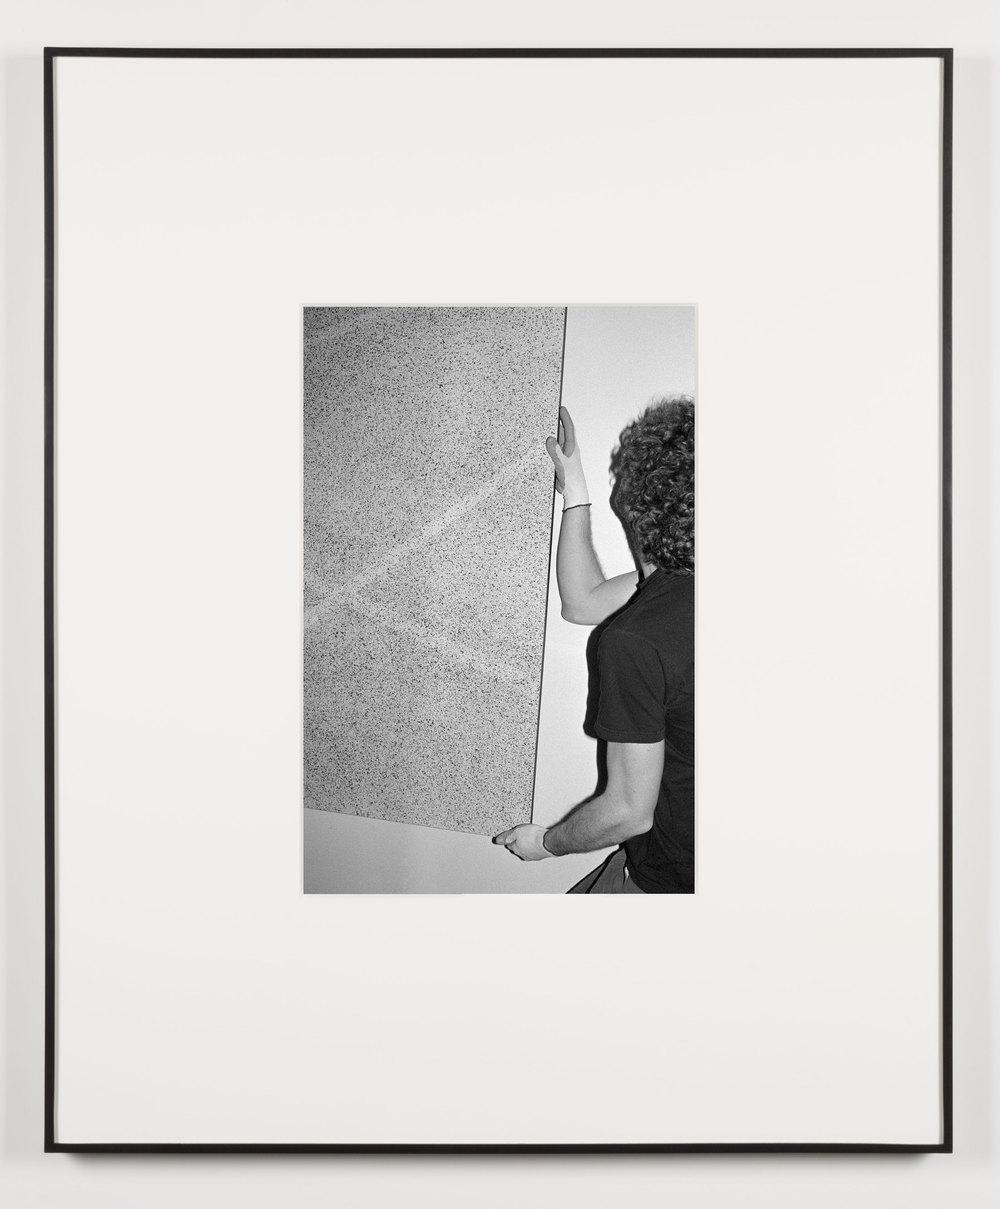 Die Mütter (Waltham, Massachusetts, February 4, 2013)    2014   Black and white digital fiber print  20 x 13 1/2 inches   Selected Bodies of Work, 2014